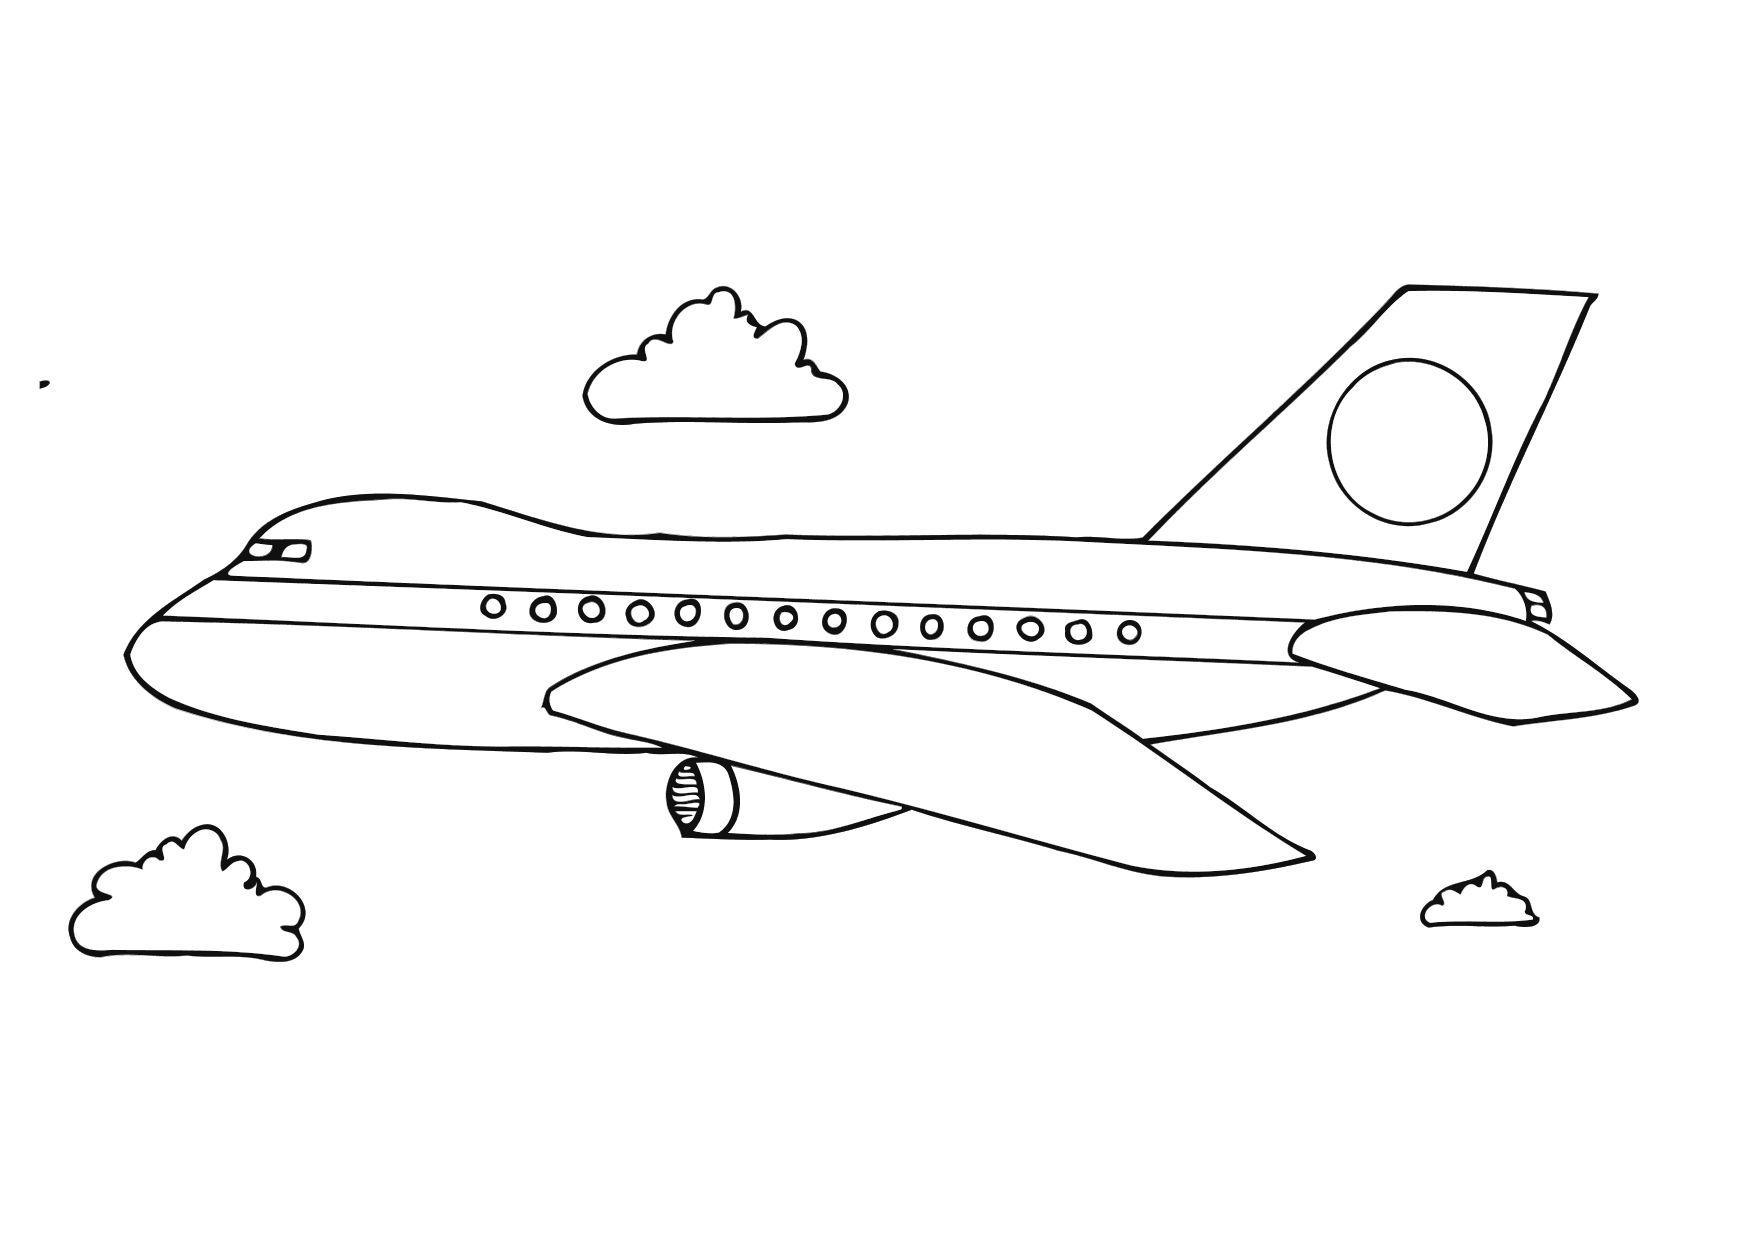 Gratis Kleurplaten Planes.Bernard Vargas Kleurplaat Vliegtuig